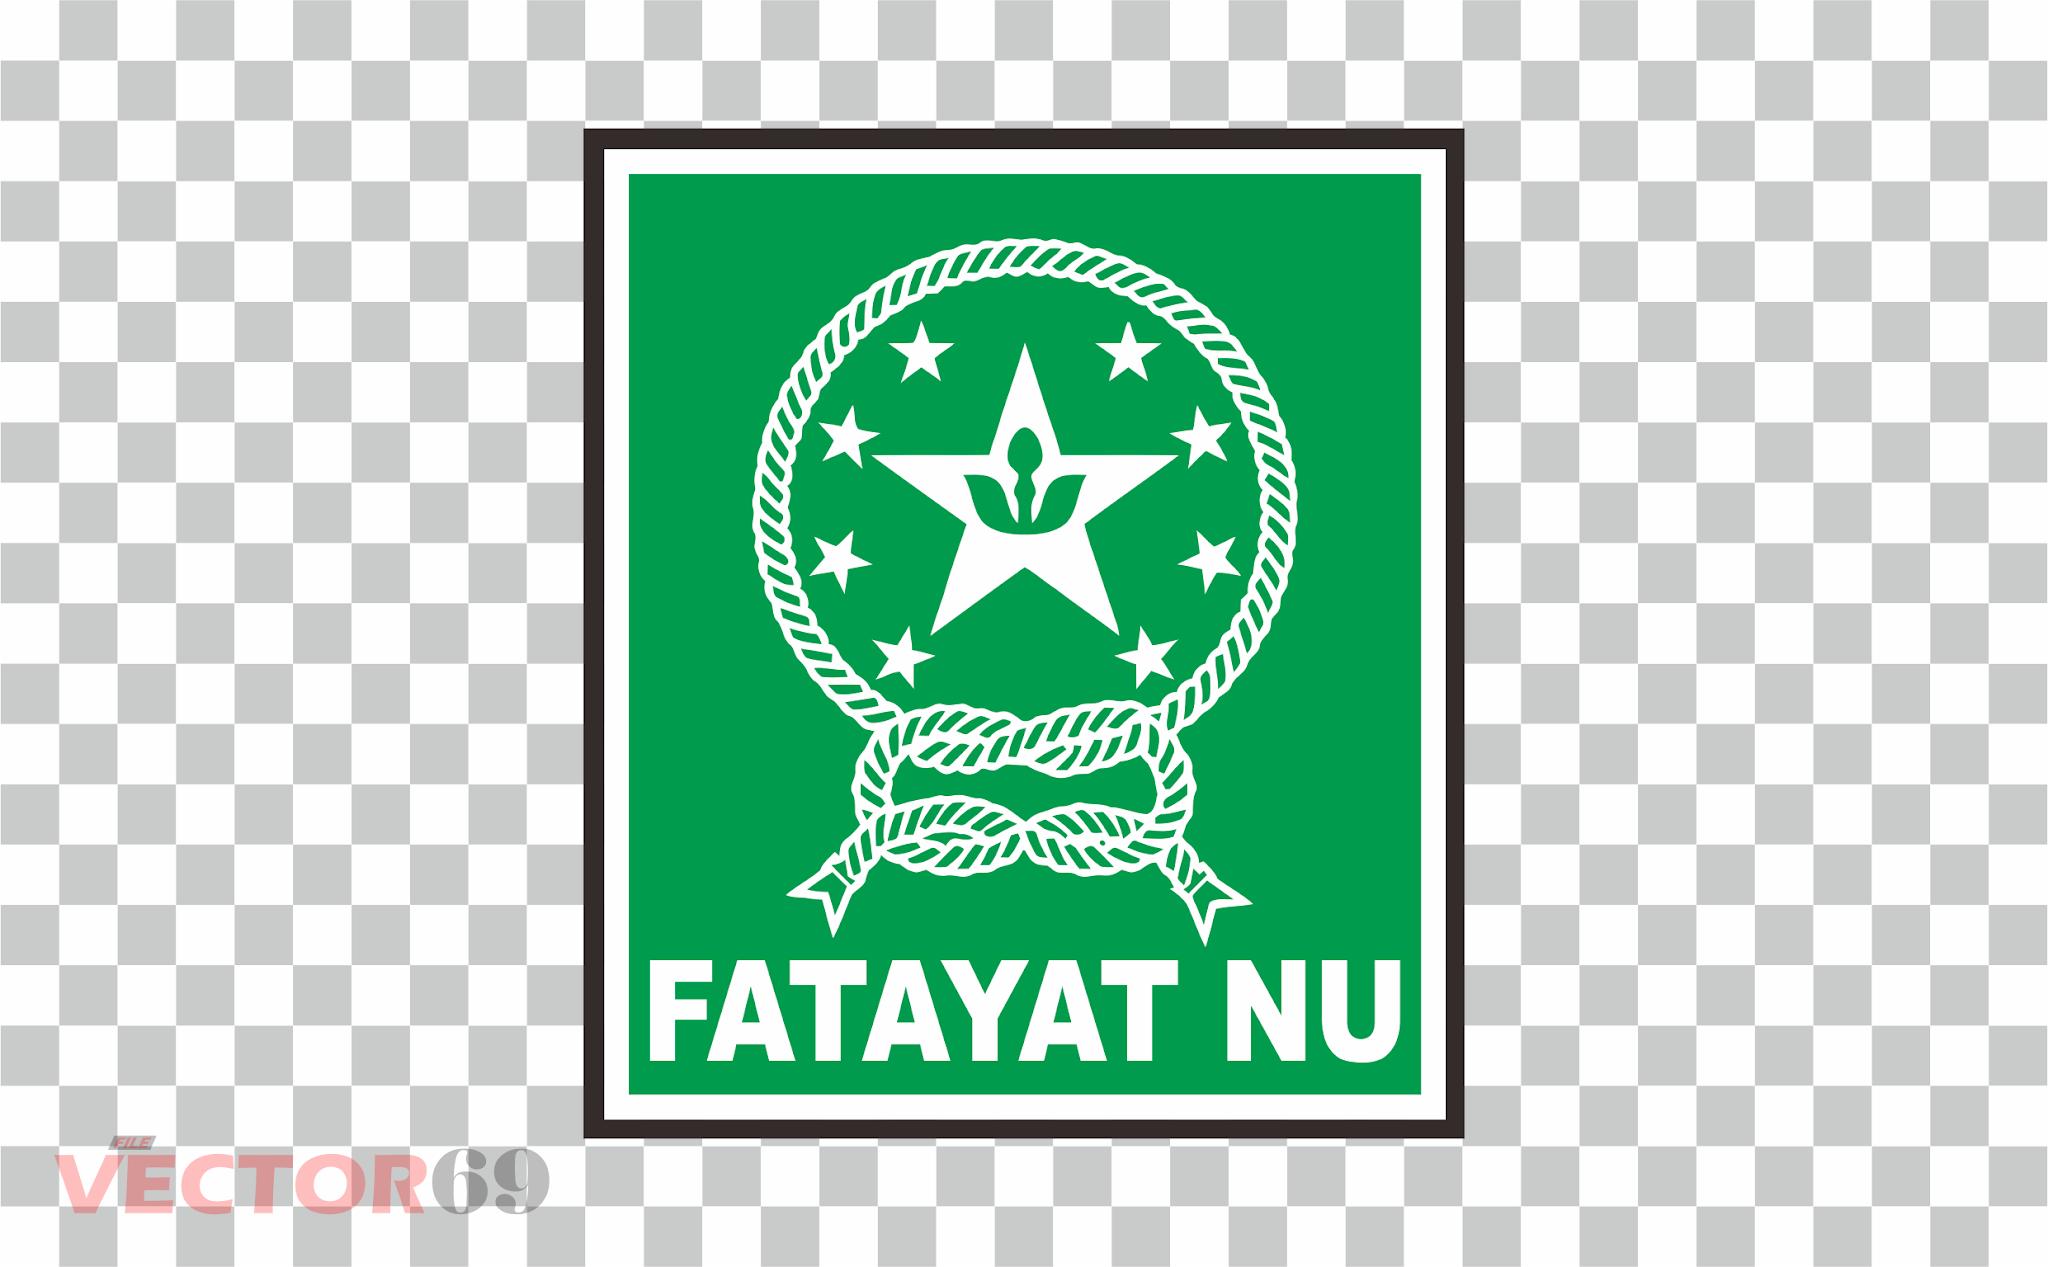 Fatayat NU Logo - Download Vector File PNG (Portable Network Graphics)